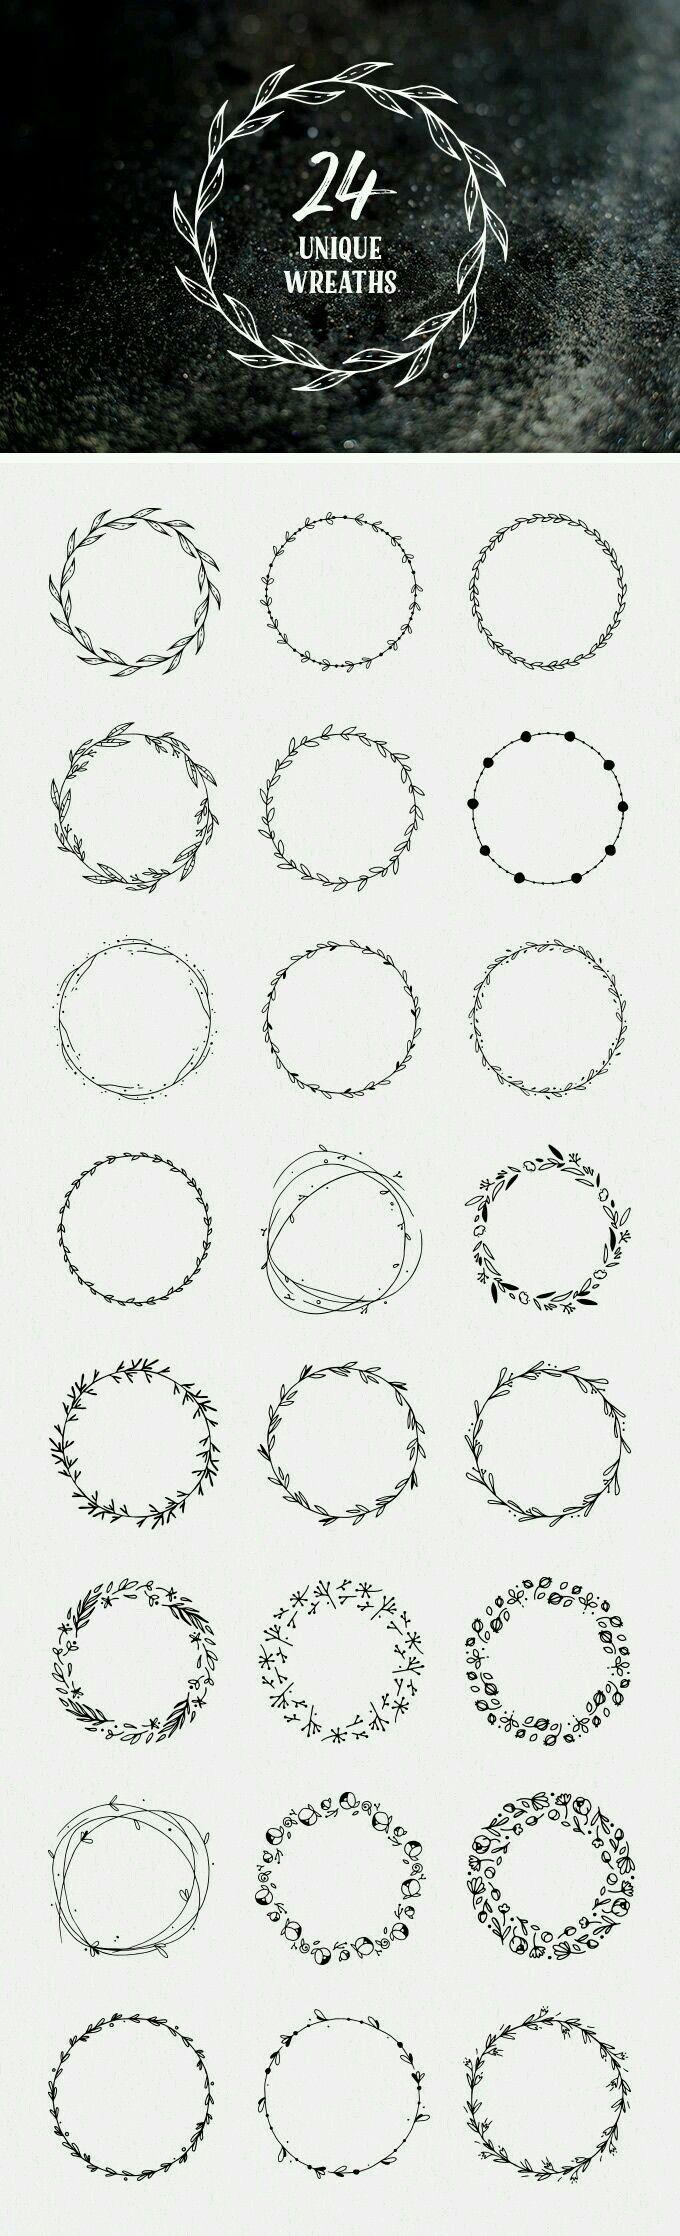 Capas Trabalhos Napady Na Kresleni Pinterest Bullet Journal